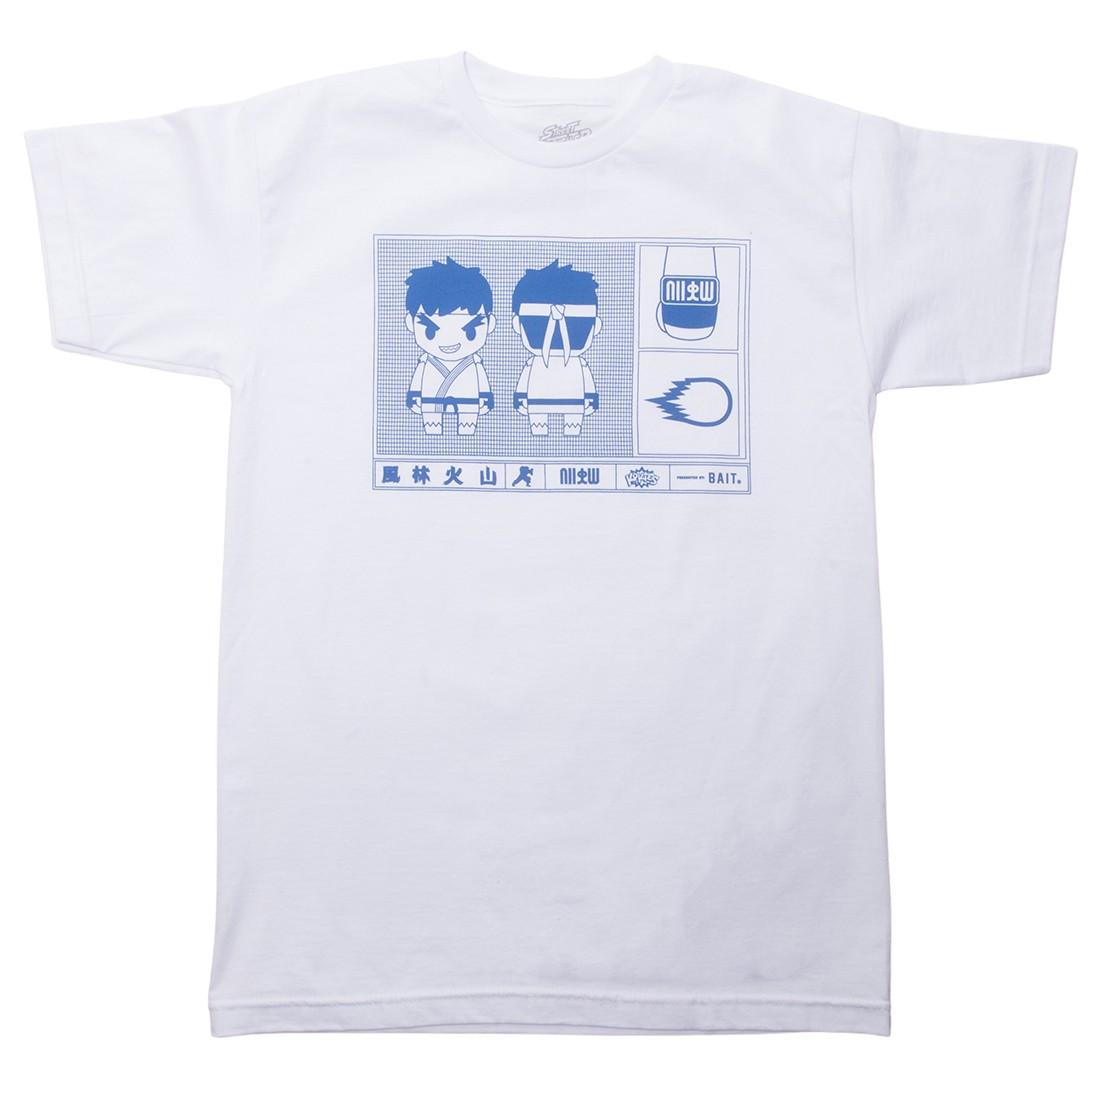 BAIT x Street Fighter Ryu Men Kokies Design Tee (white)